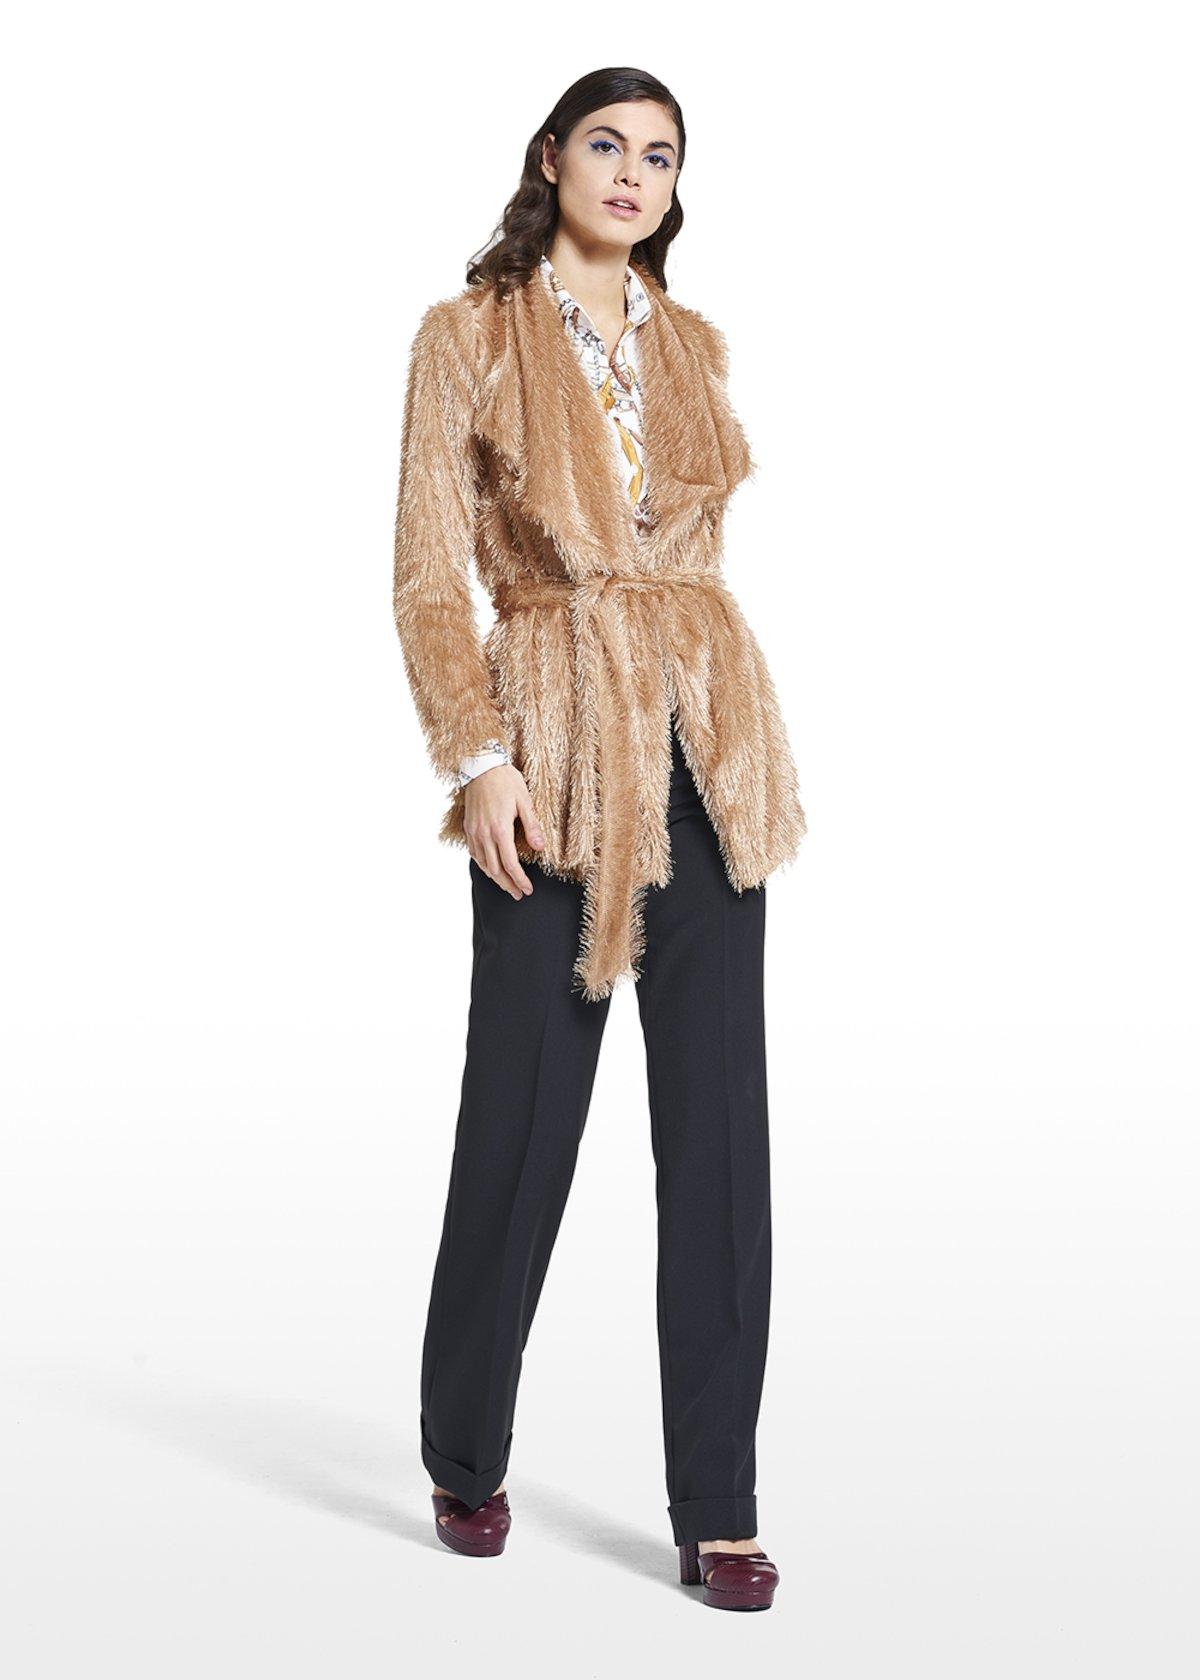 Eco-fur cardigan Conrad with belt - Light Beige - Woman - Category image